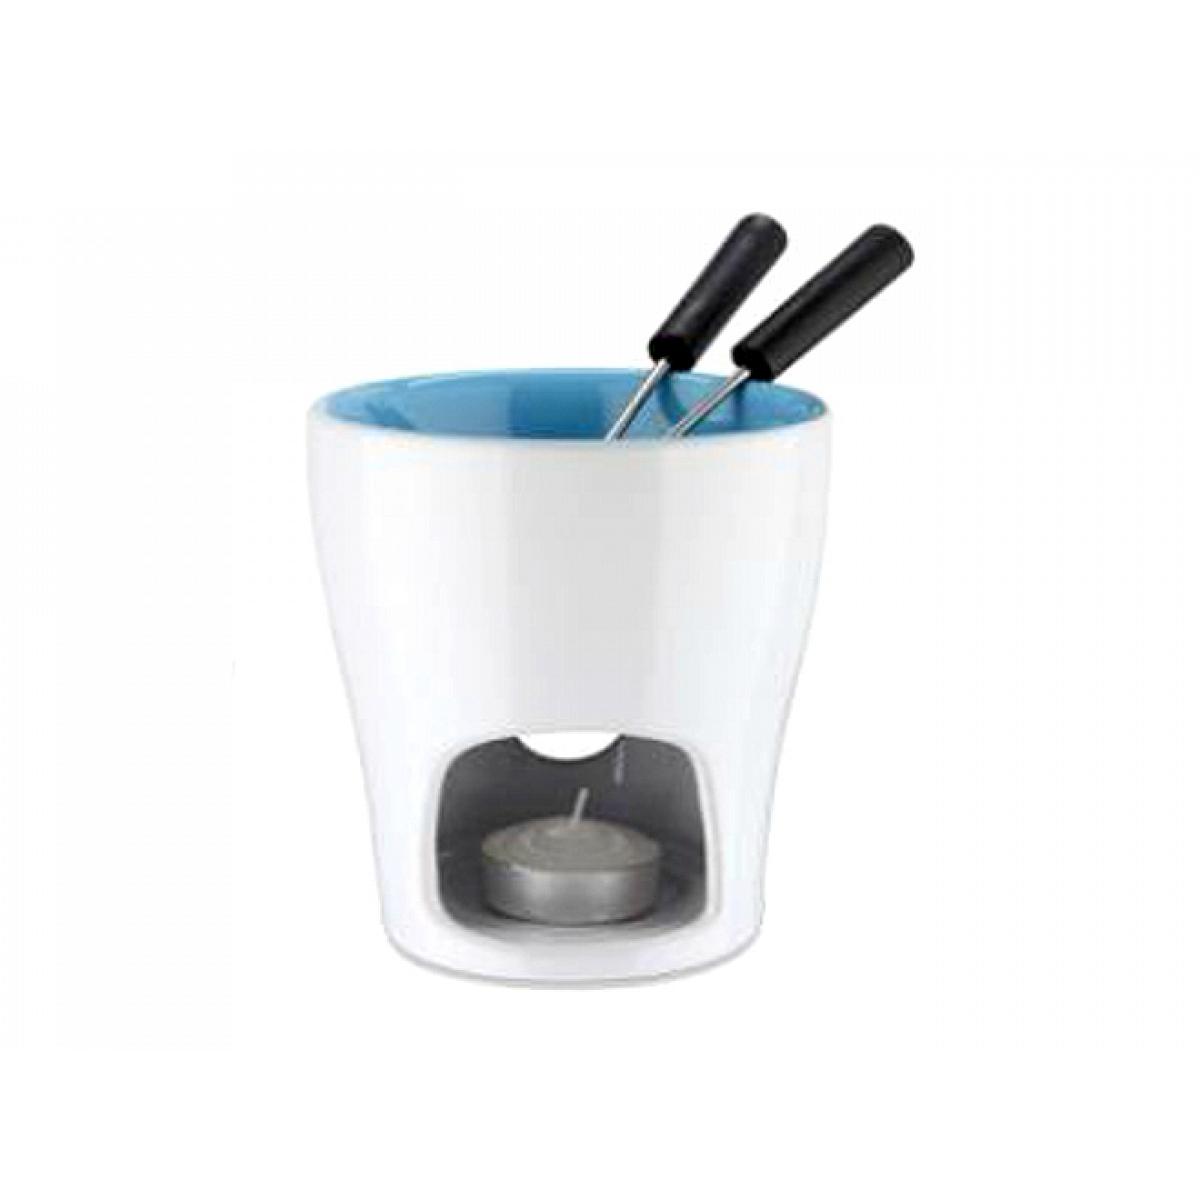 5 teiliges schoko fondue eva collection innen blau eva. Black Bedroom Furniture Sets. Home Design Ideas